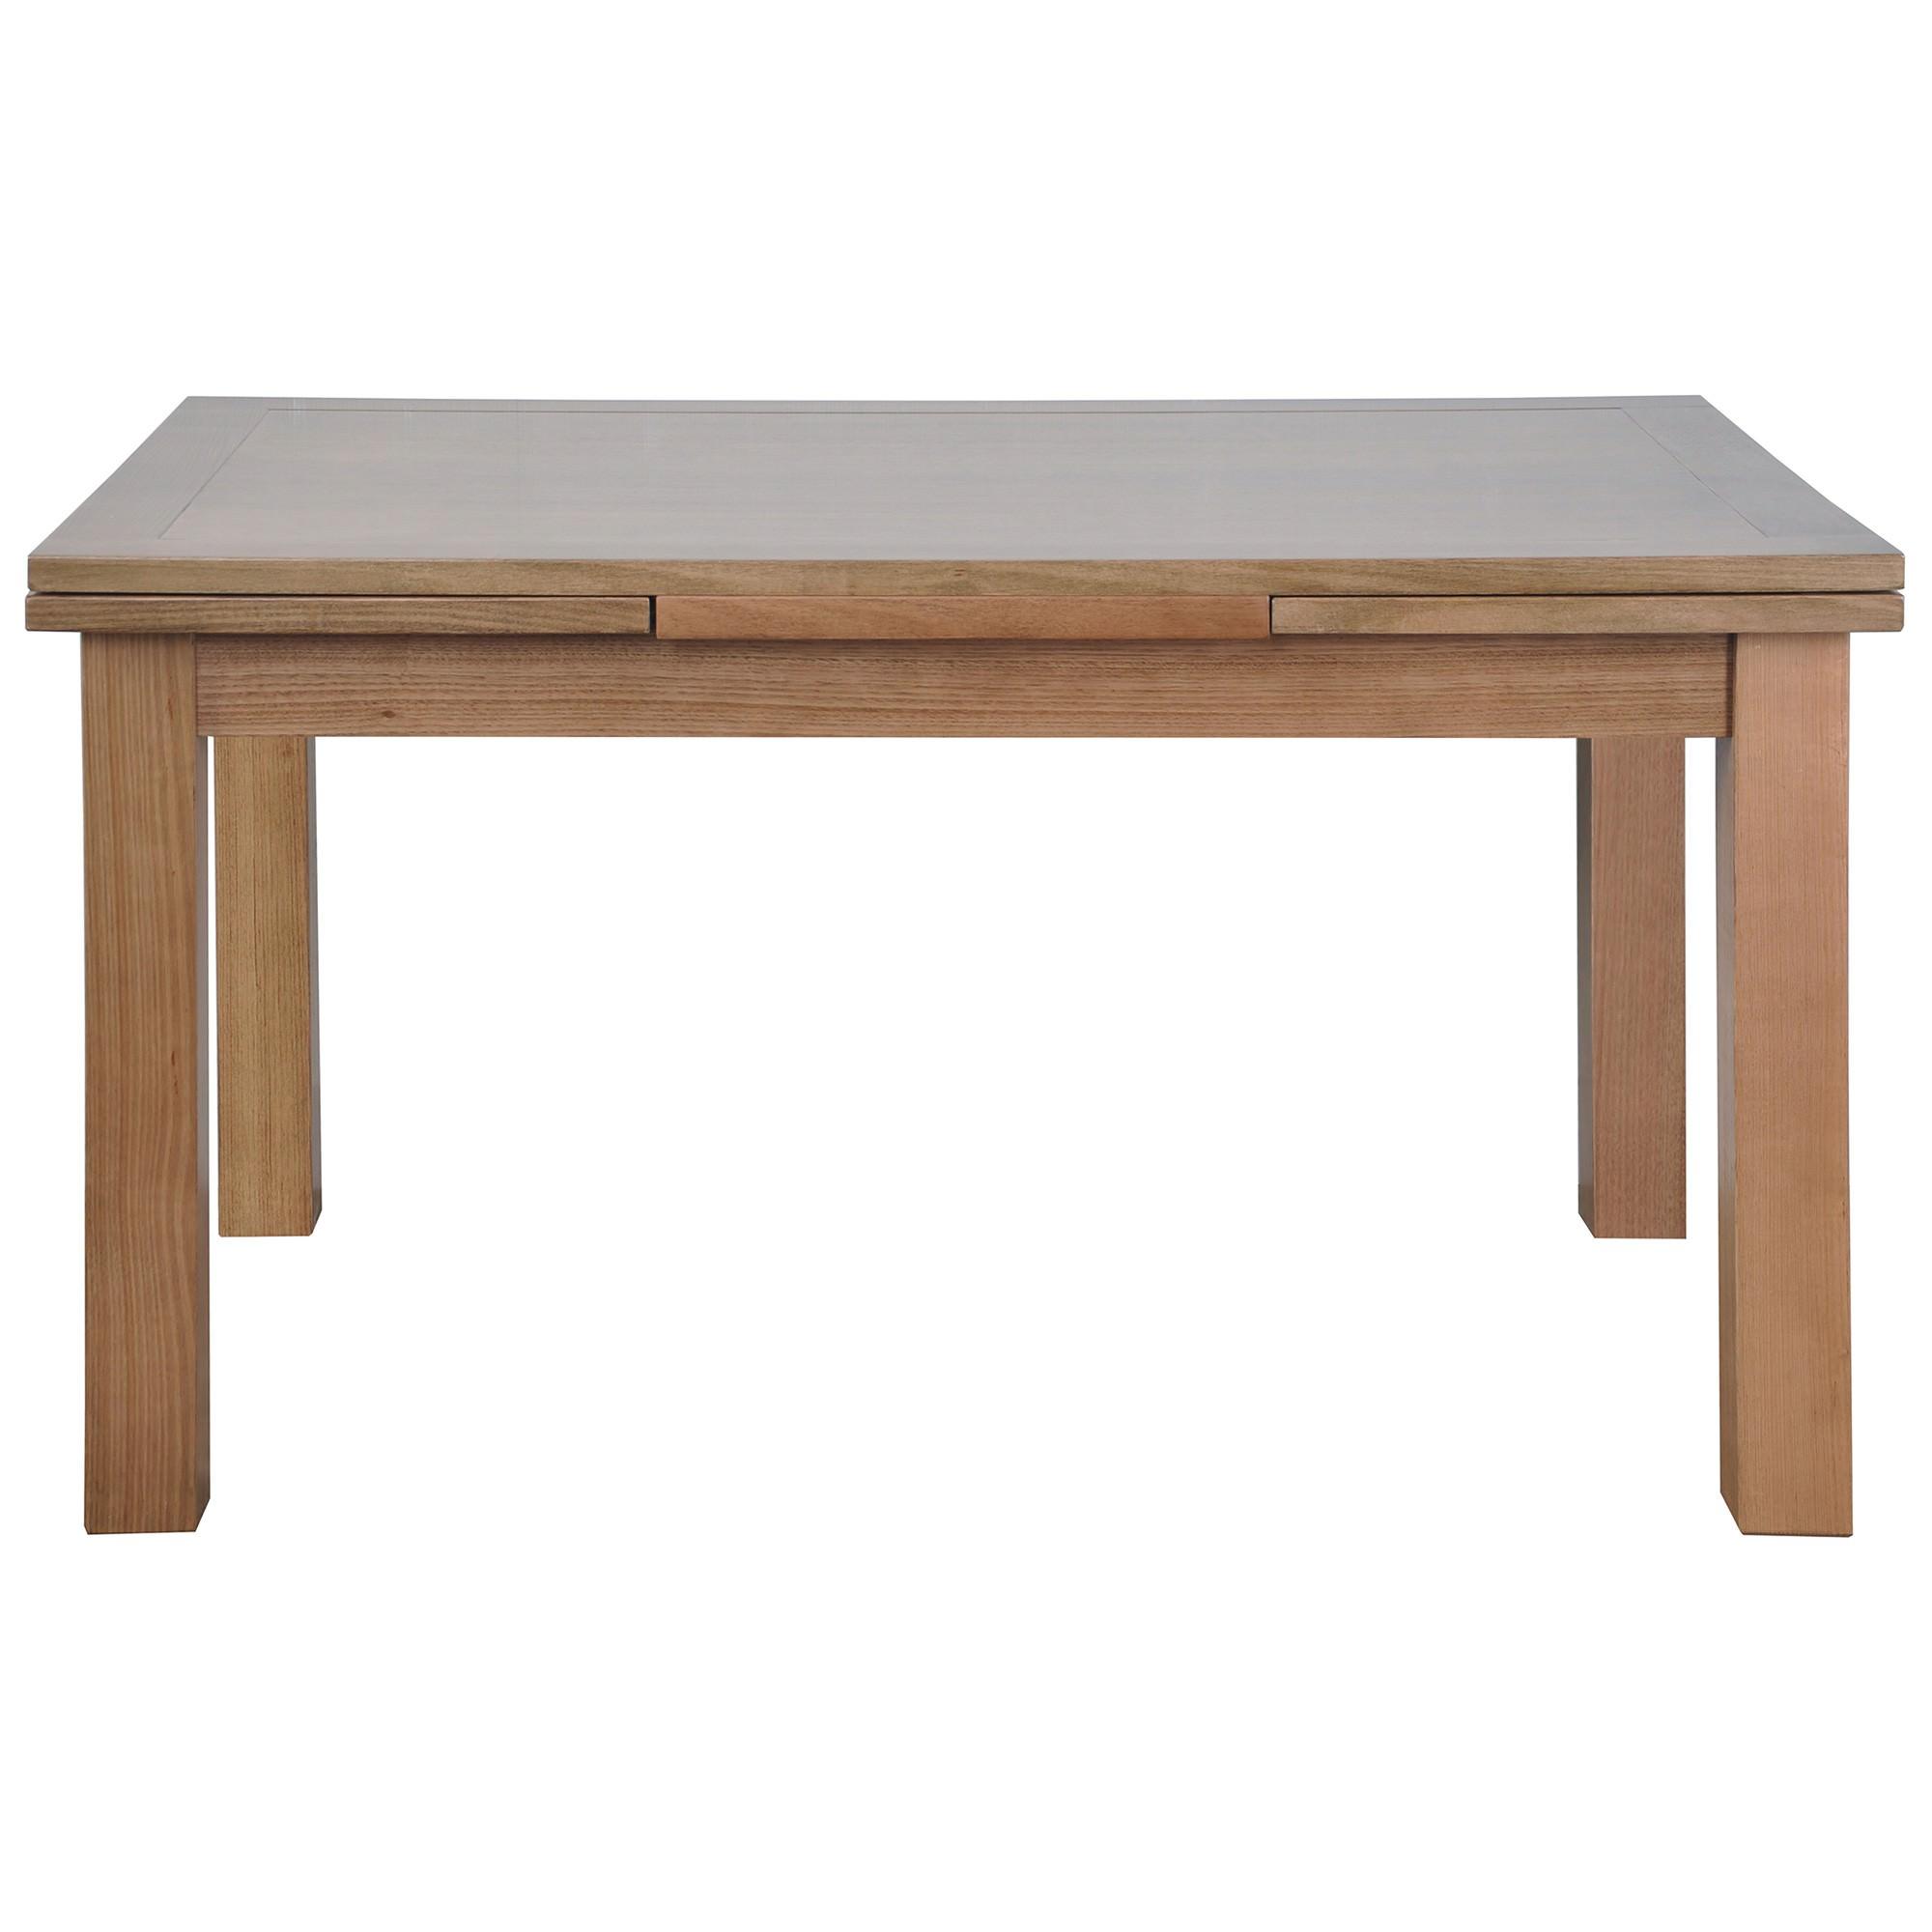 Conover Tasmanian Oak Timber Extendable Dining Table, 150-250cm